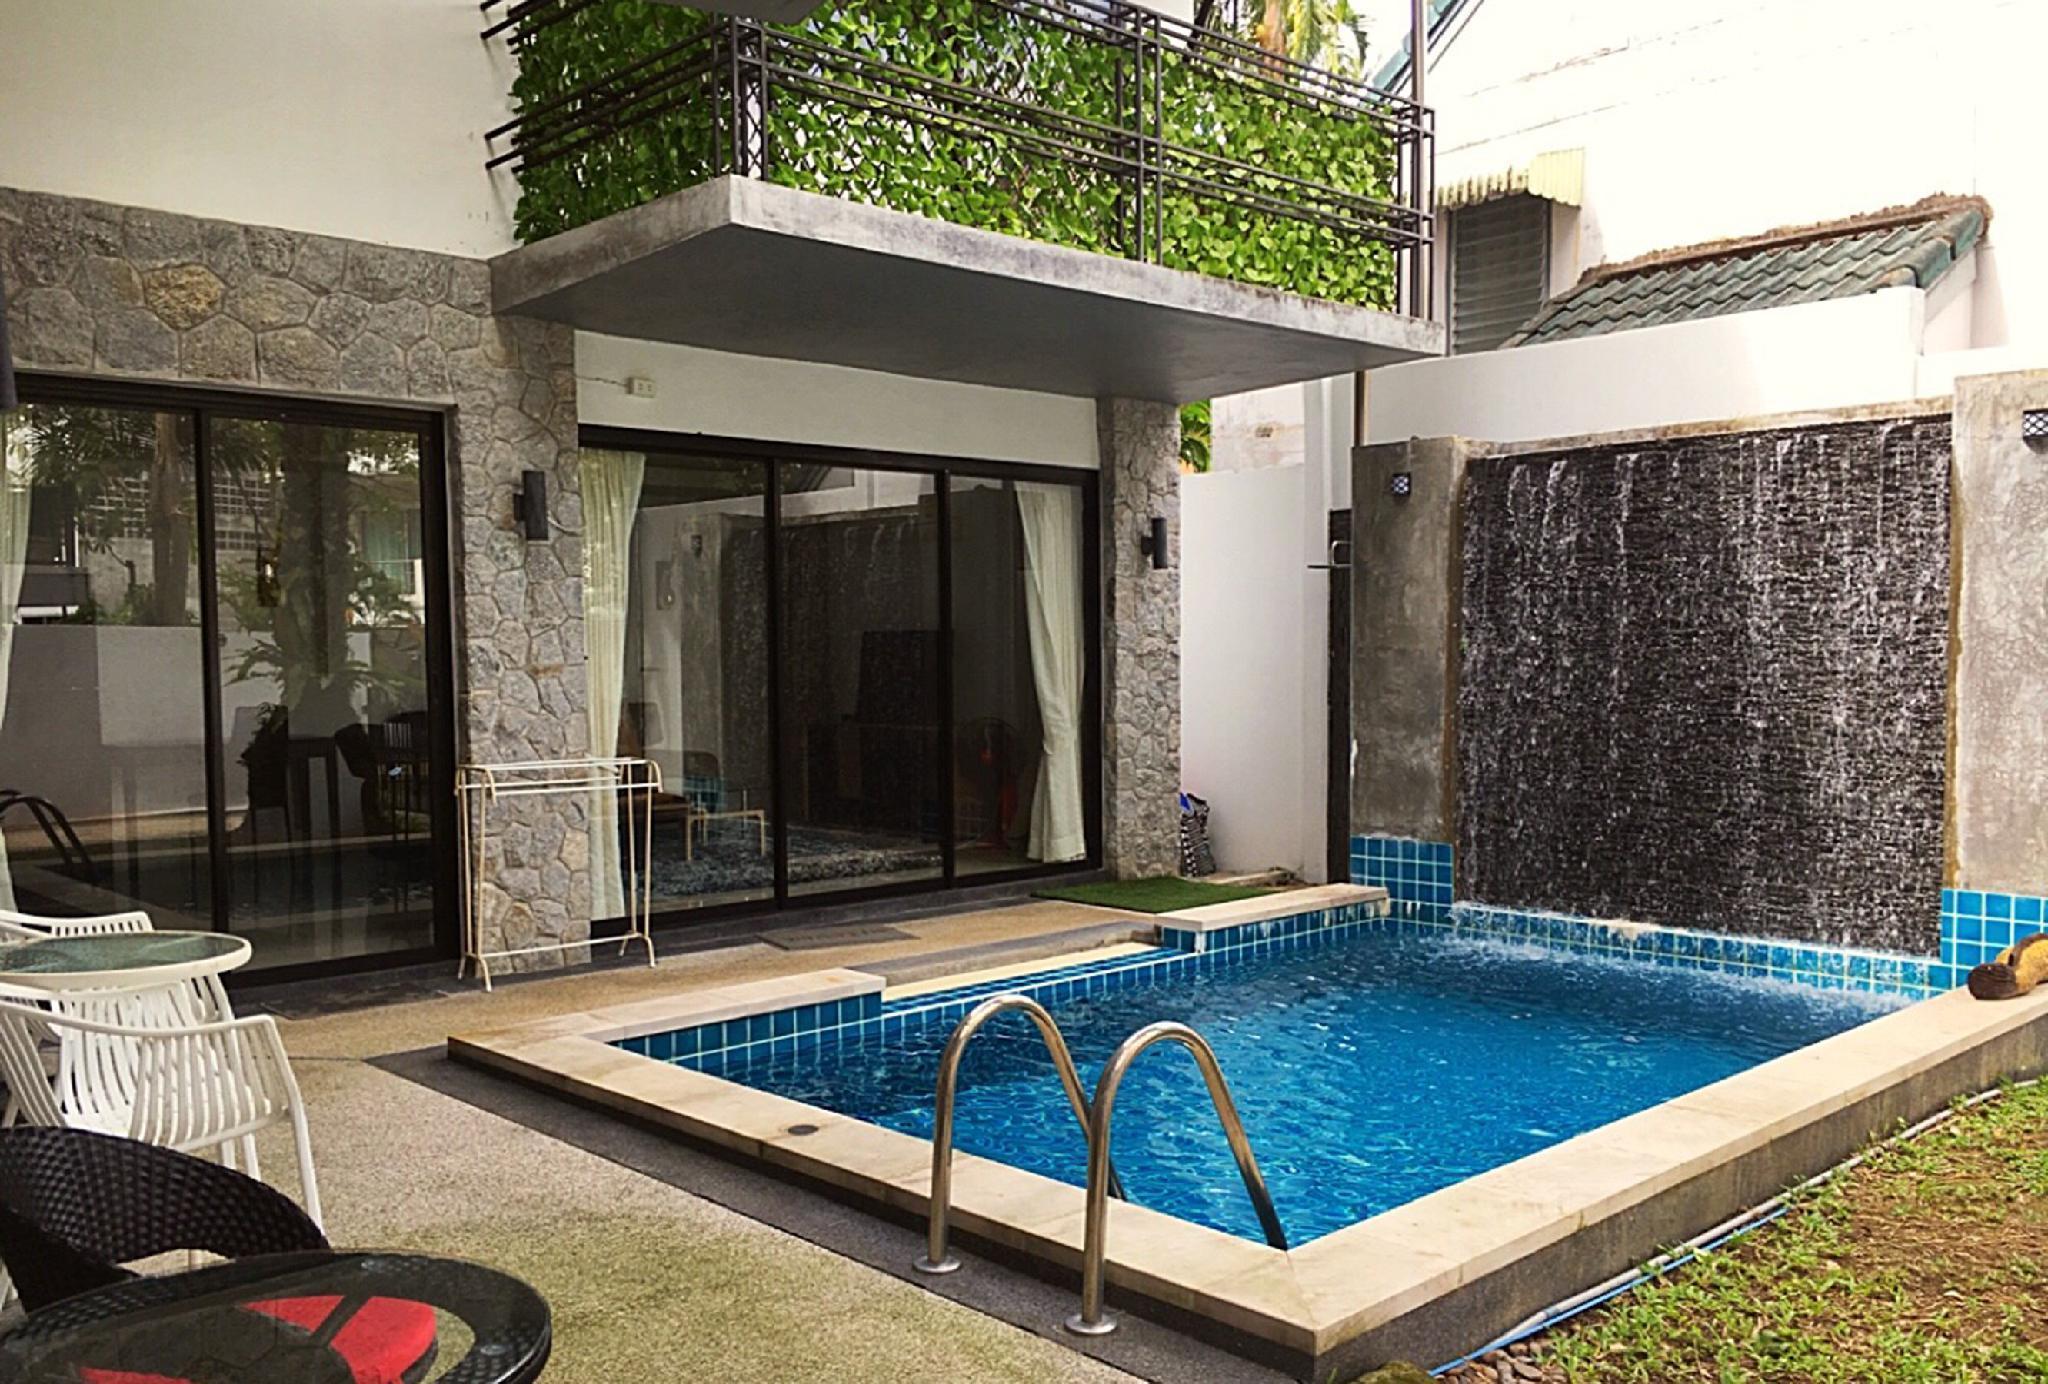 Excellent private pool villa 3 bedroom, near beach วิลลา 3 ห้องนอน 3 ห้องน้ำส่วนตัว ขนาด 275 ตร.ม. – กมลา